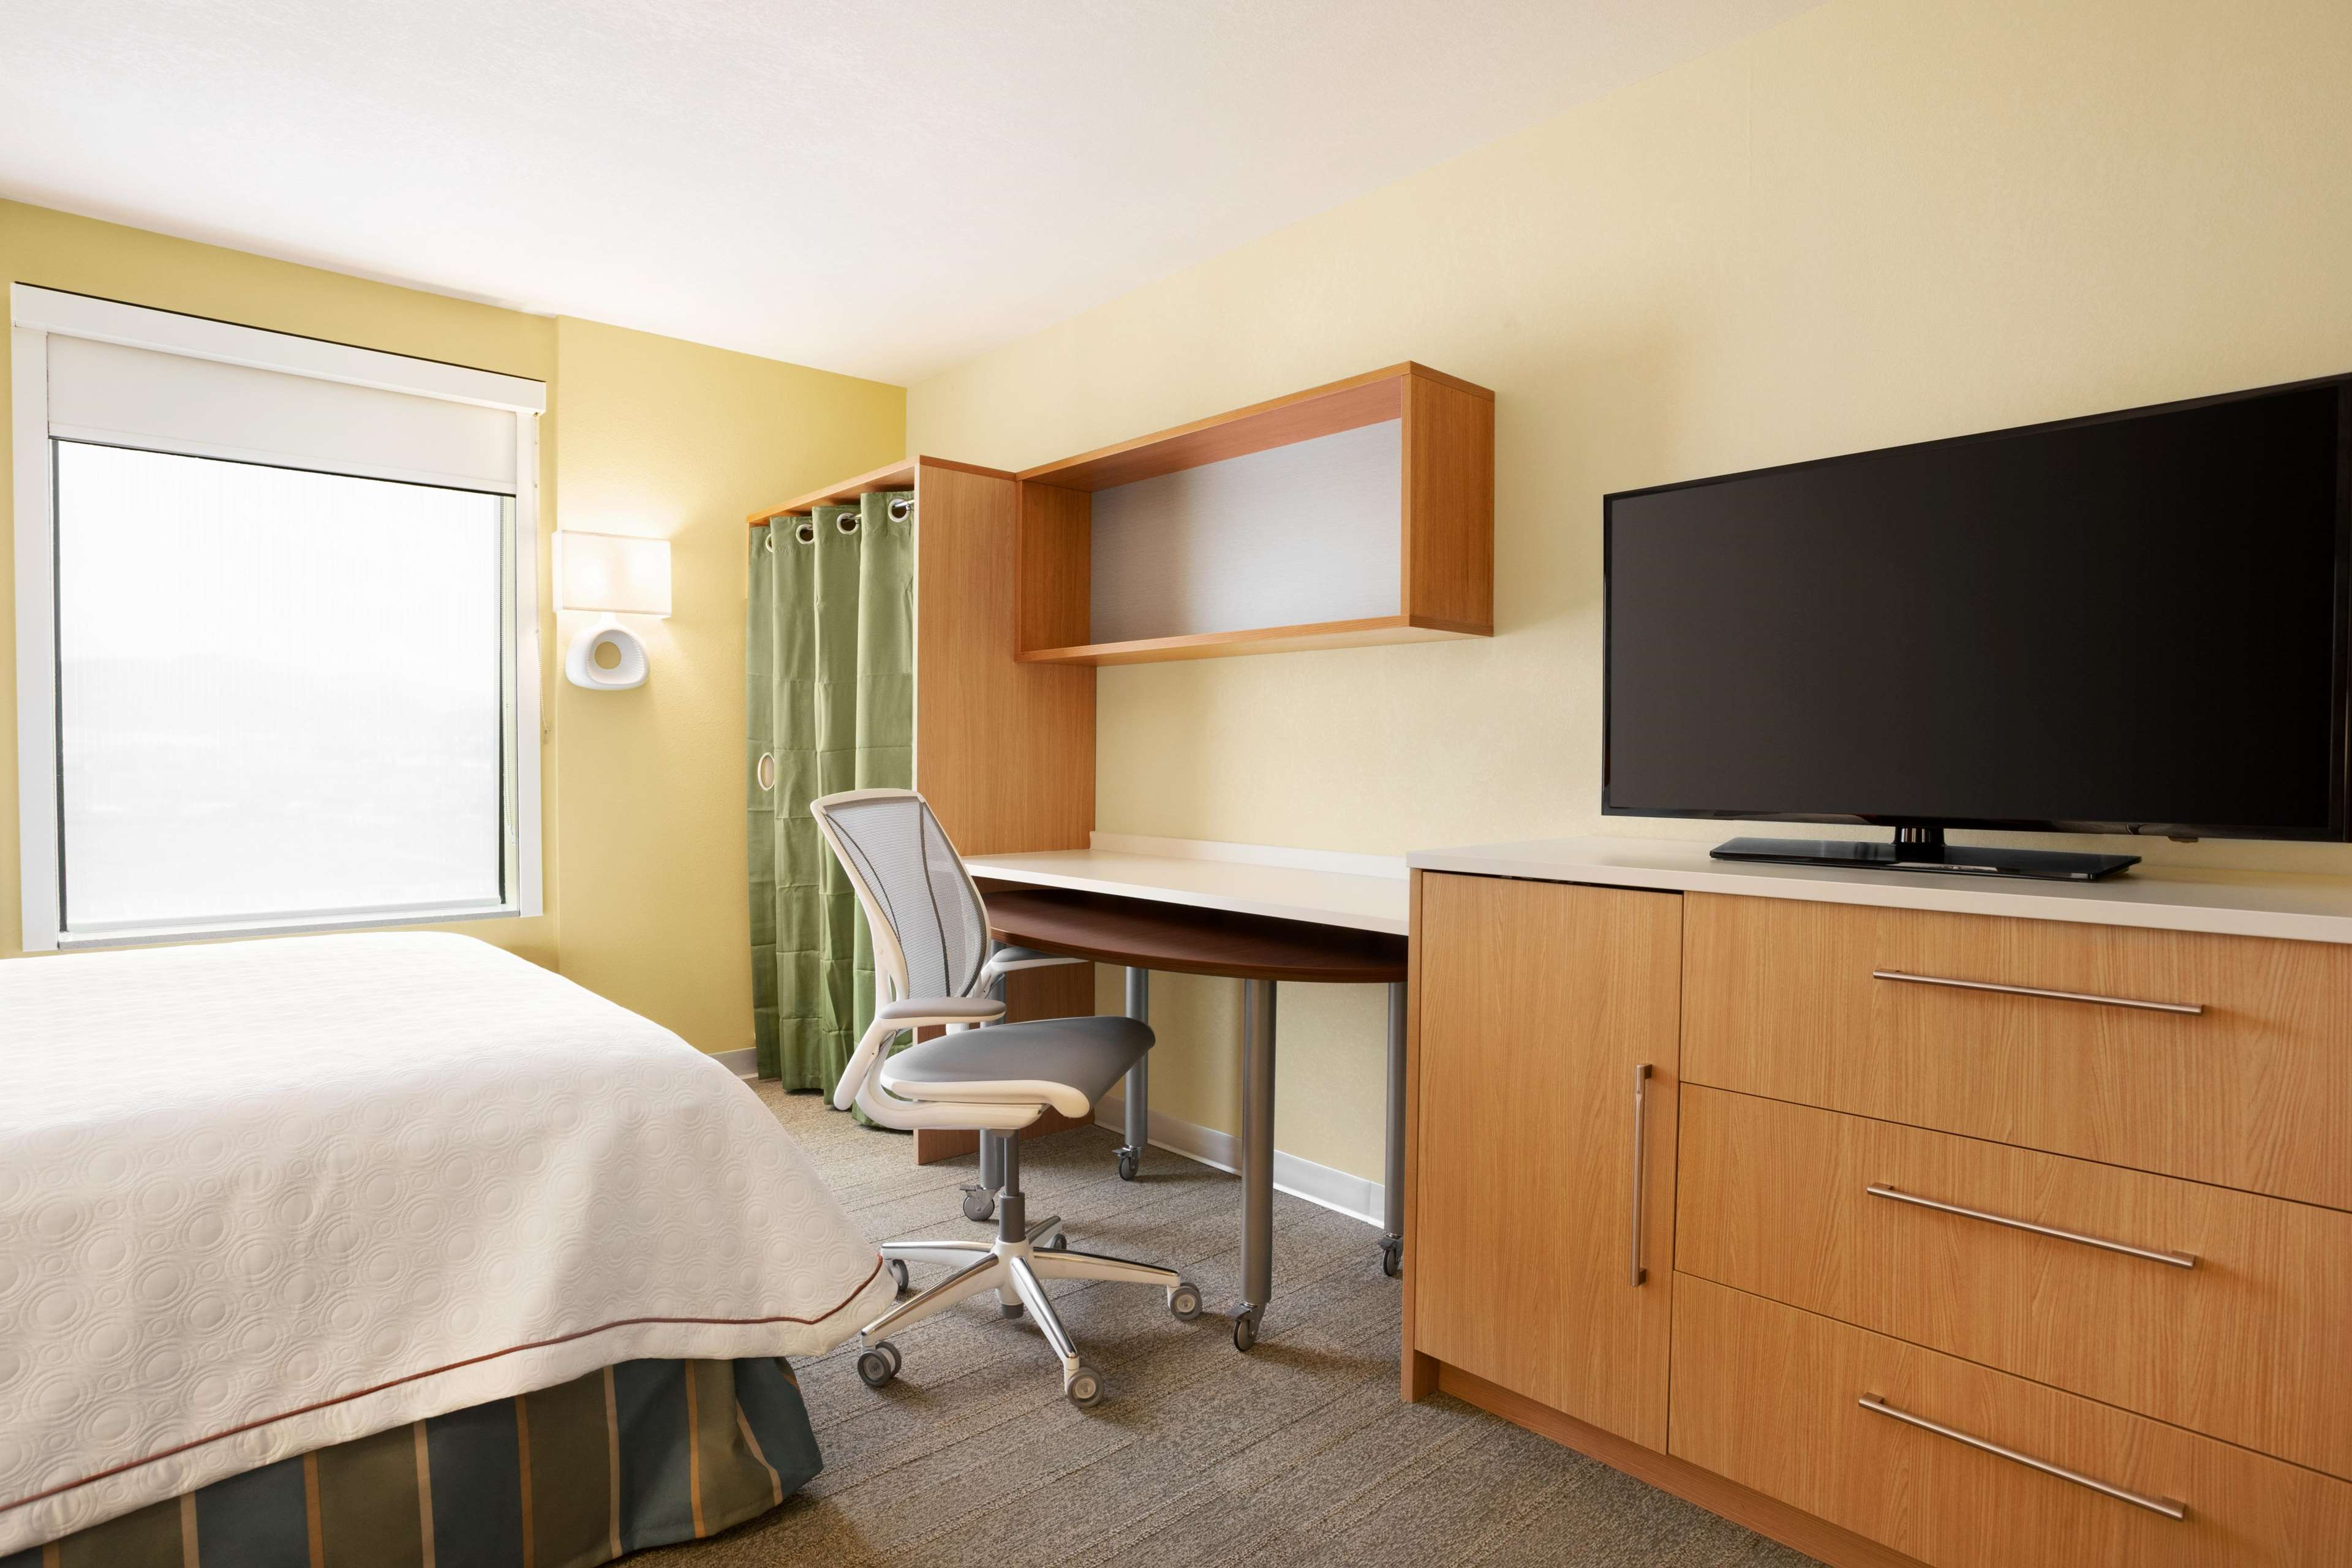 Home2 Suites by Hilton Elko image 21